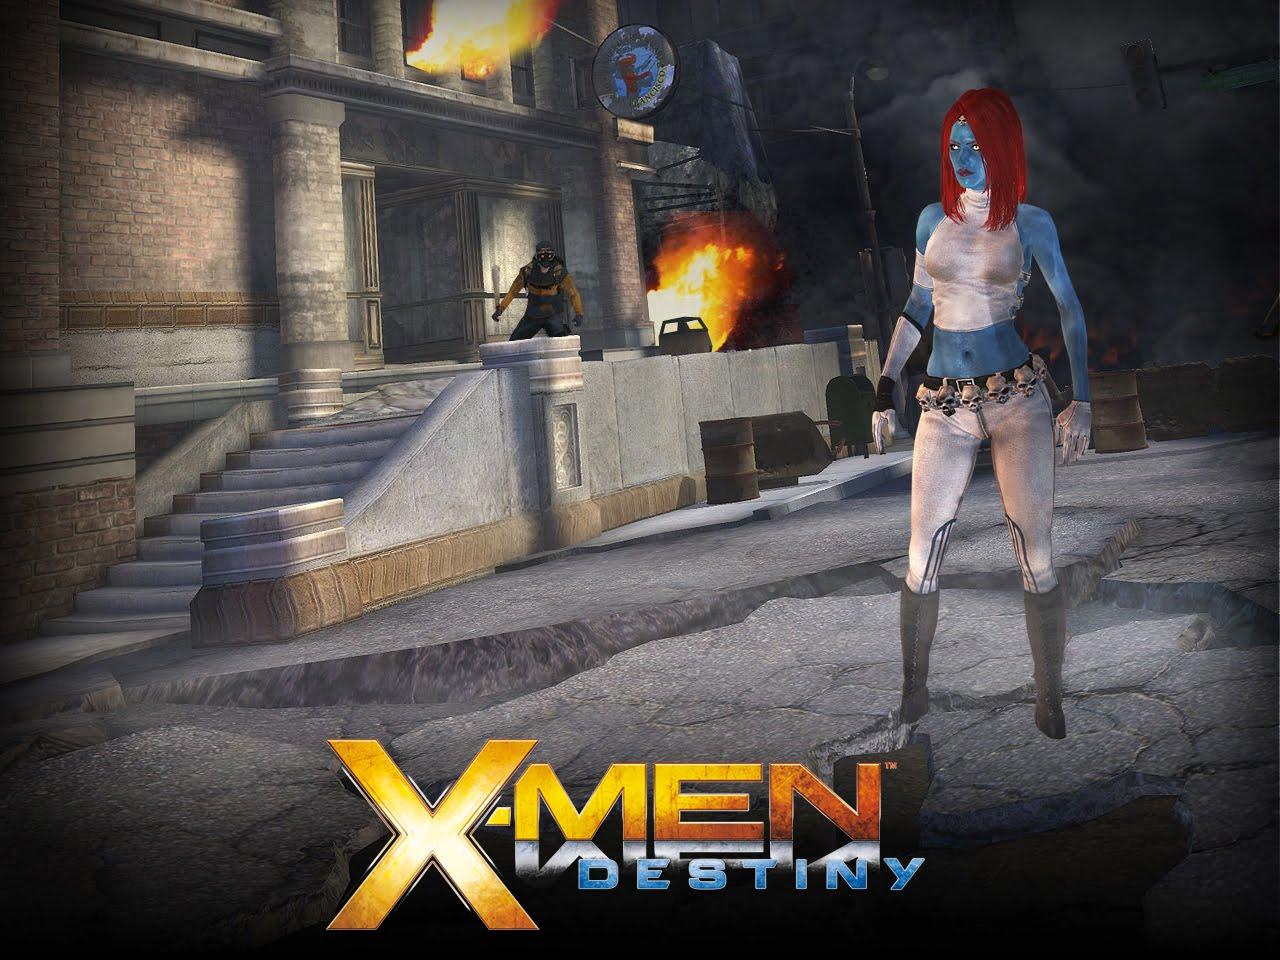 X Men Destiny Wallpapers Video Game Hq X Men Destiny Pictures 4k Wallpapers 2019